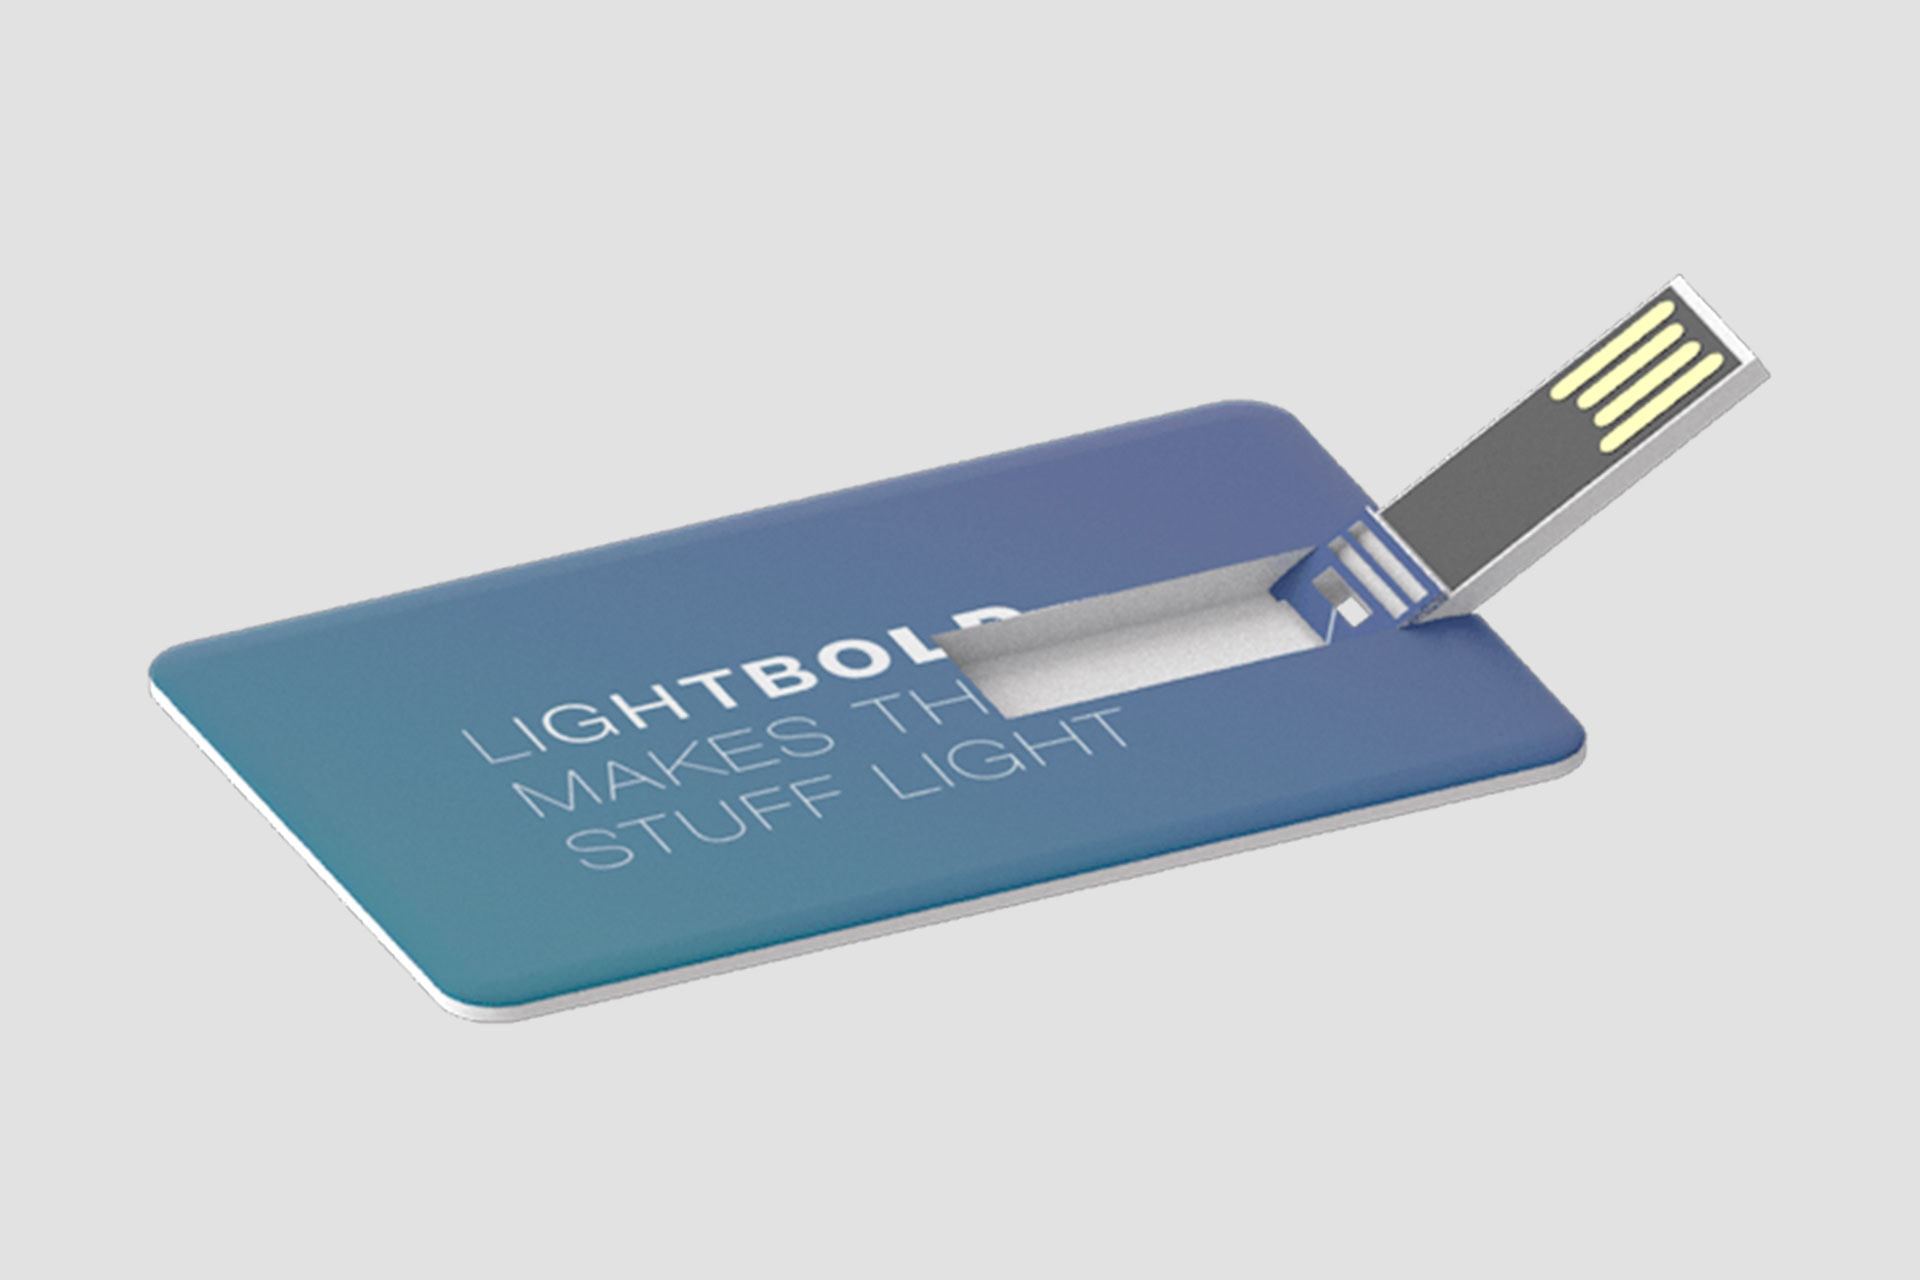 Chiavetta Usb Card ultrasottile